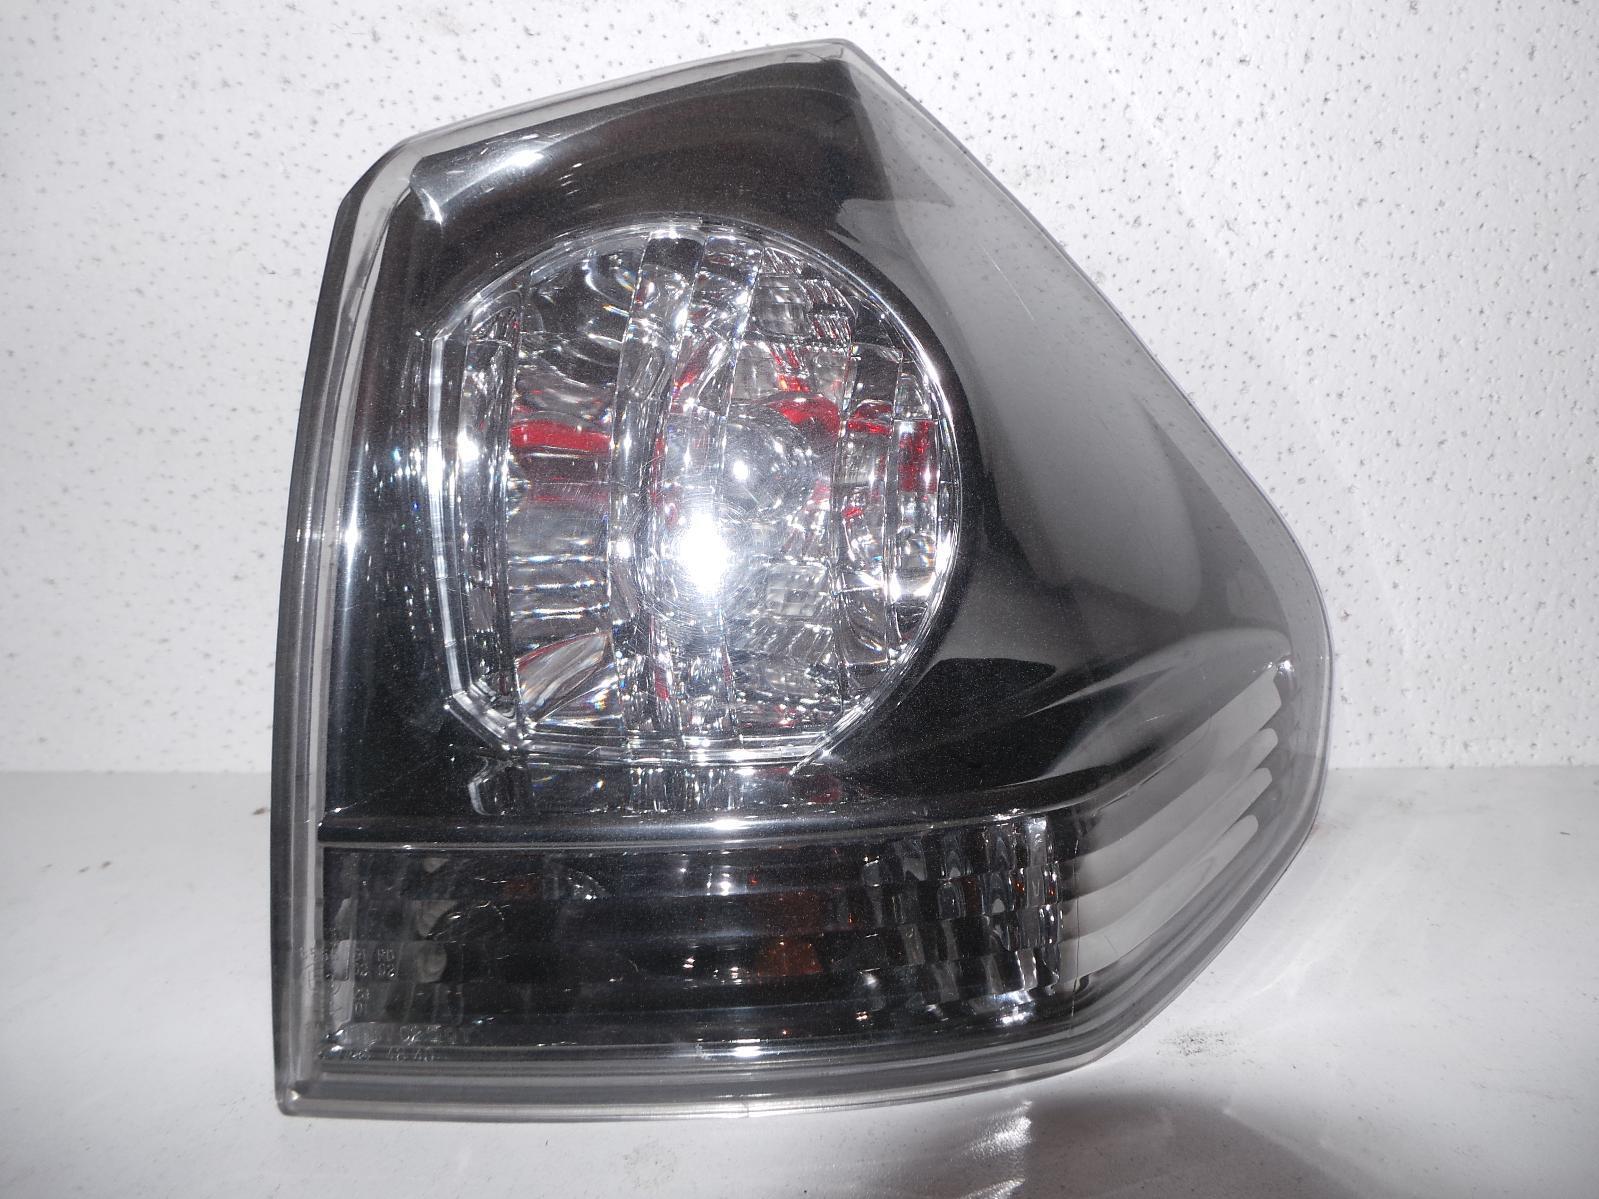 LEXUS RX330, Right Taillight, IN BODY, 04/03-12/05